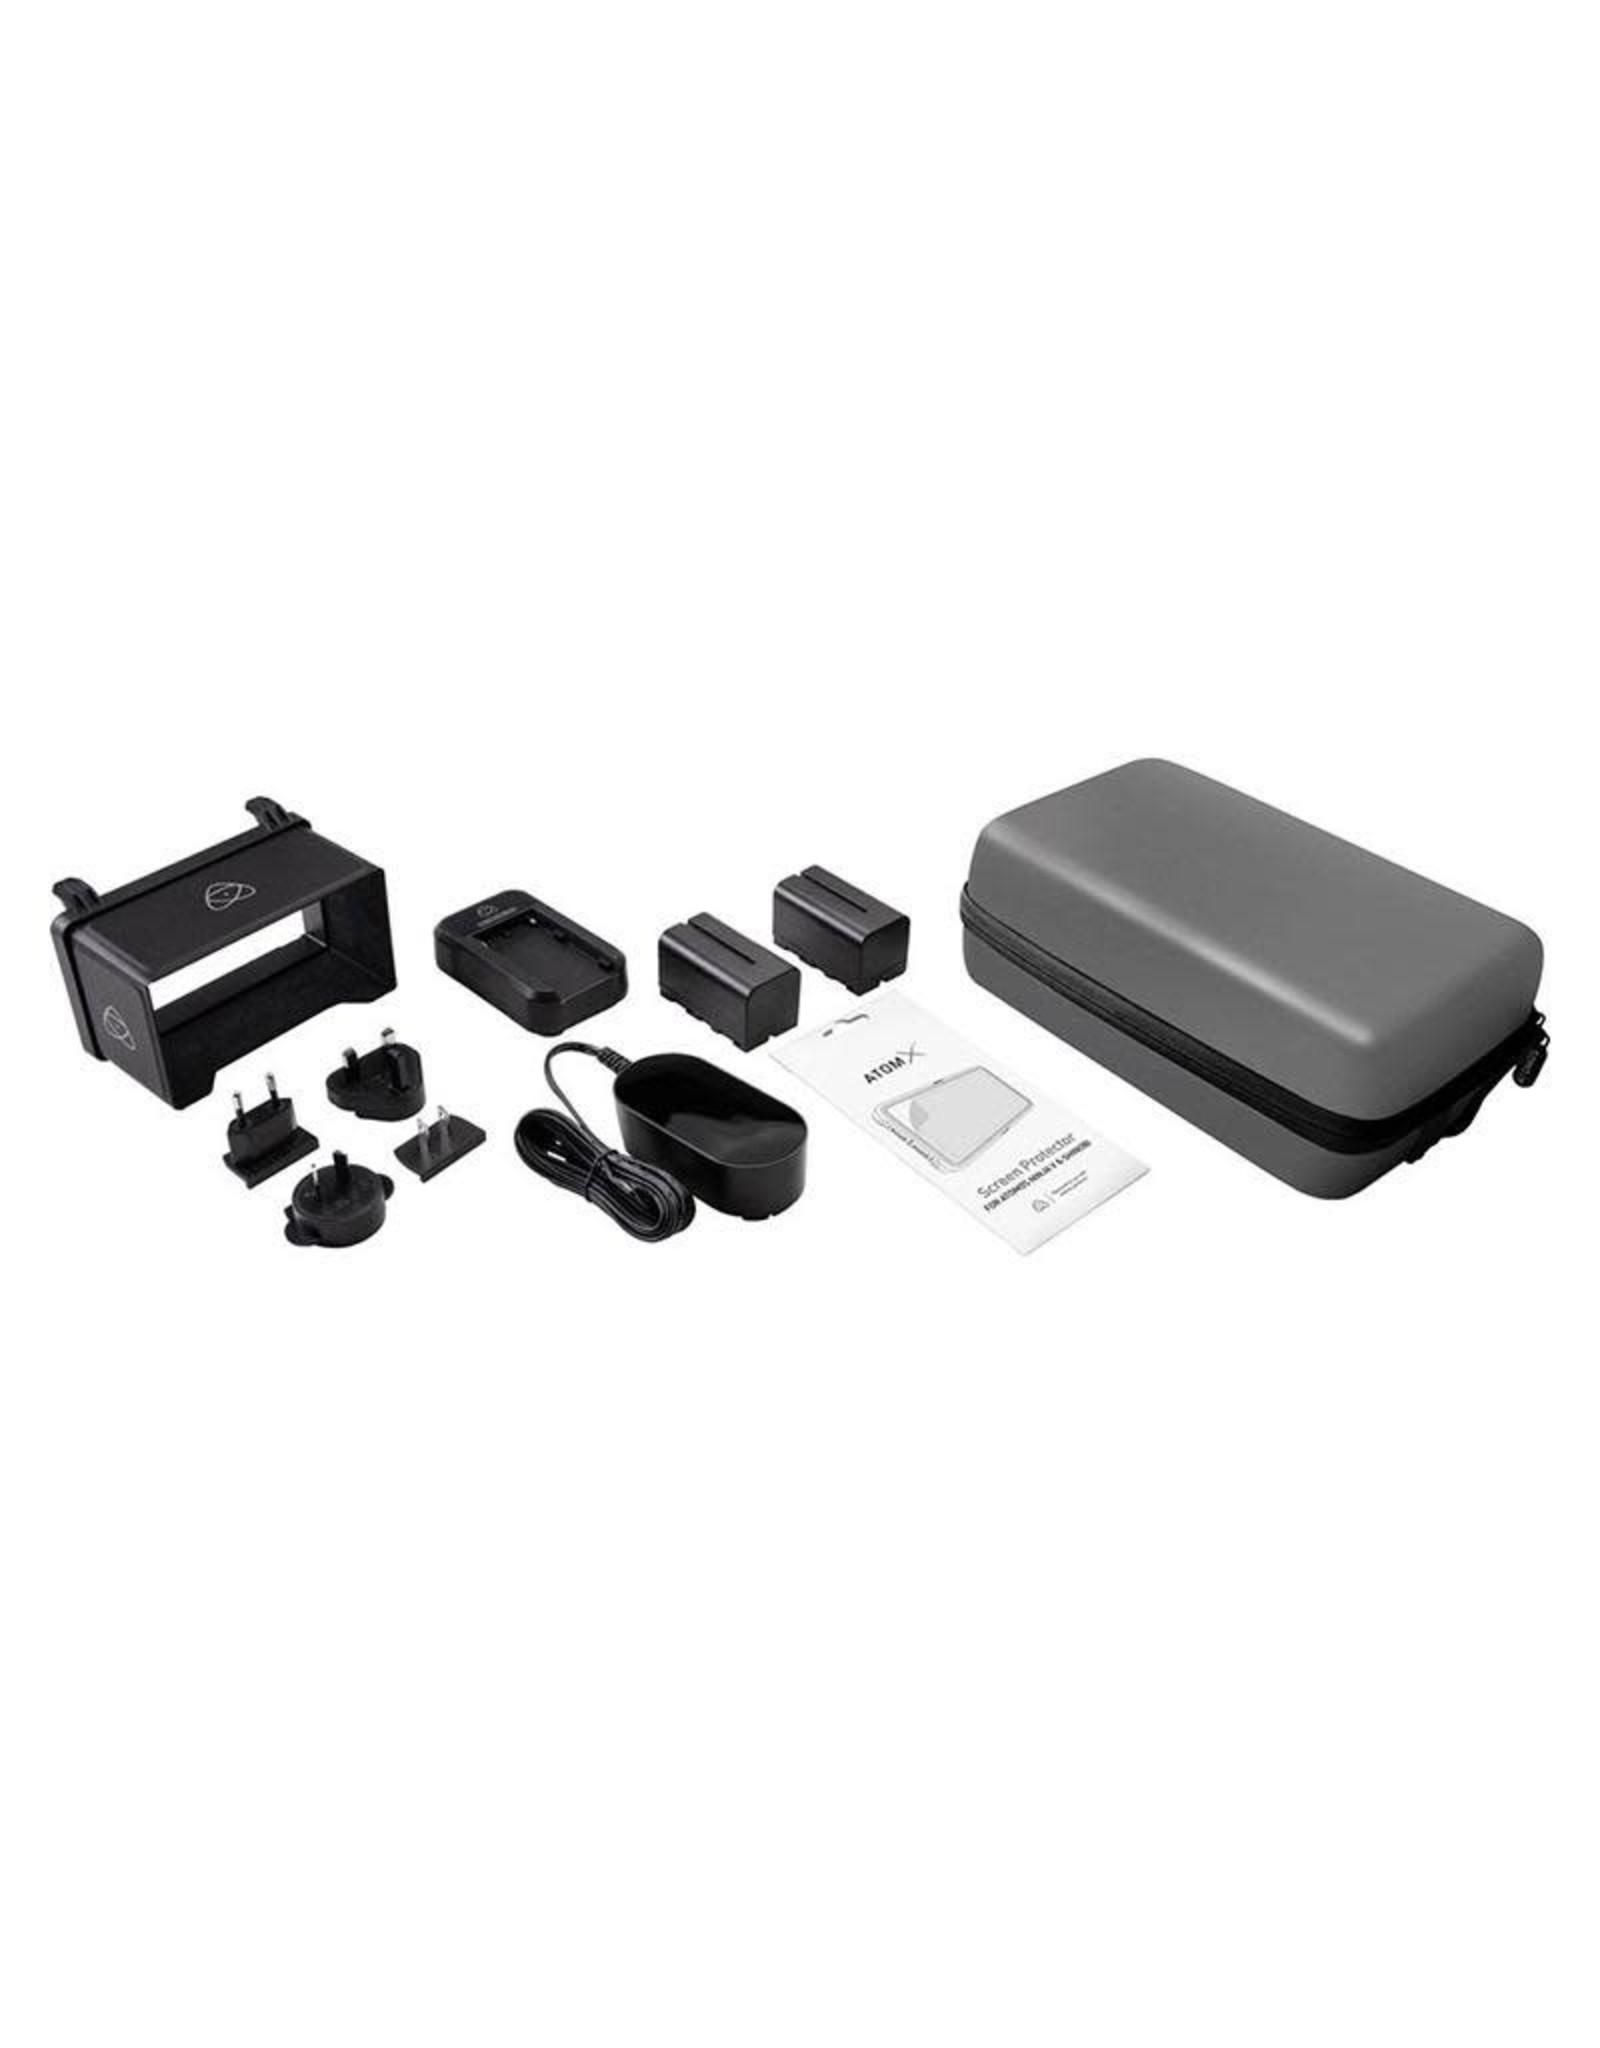 Atomos Atomos Shinobi SDI Accessory Kit: Suitable for Shinobi, Shinobi SDI and Ninja V. Travel Case, 2 x NP-F750 5200mAh battery, Fast charger, DC Power Supply, Sunhood